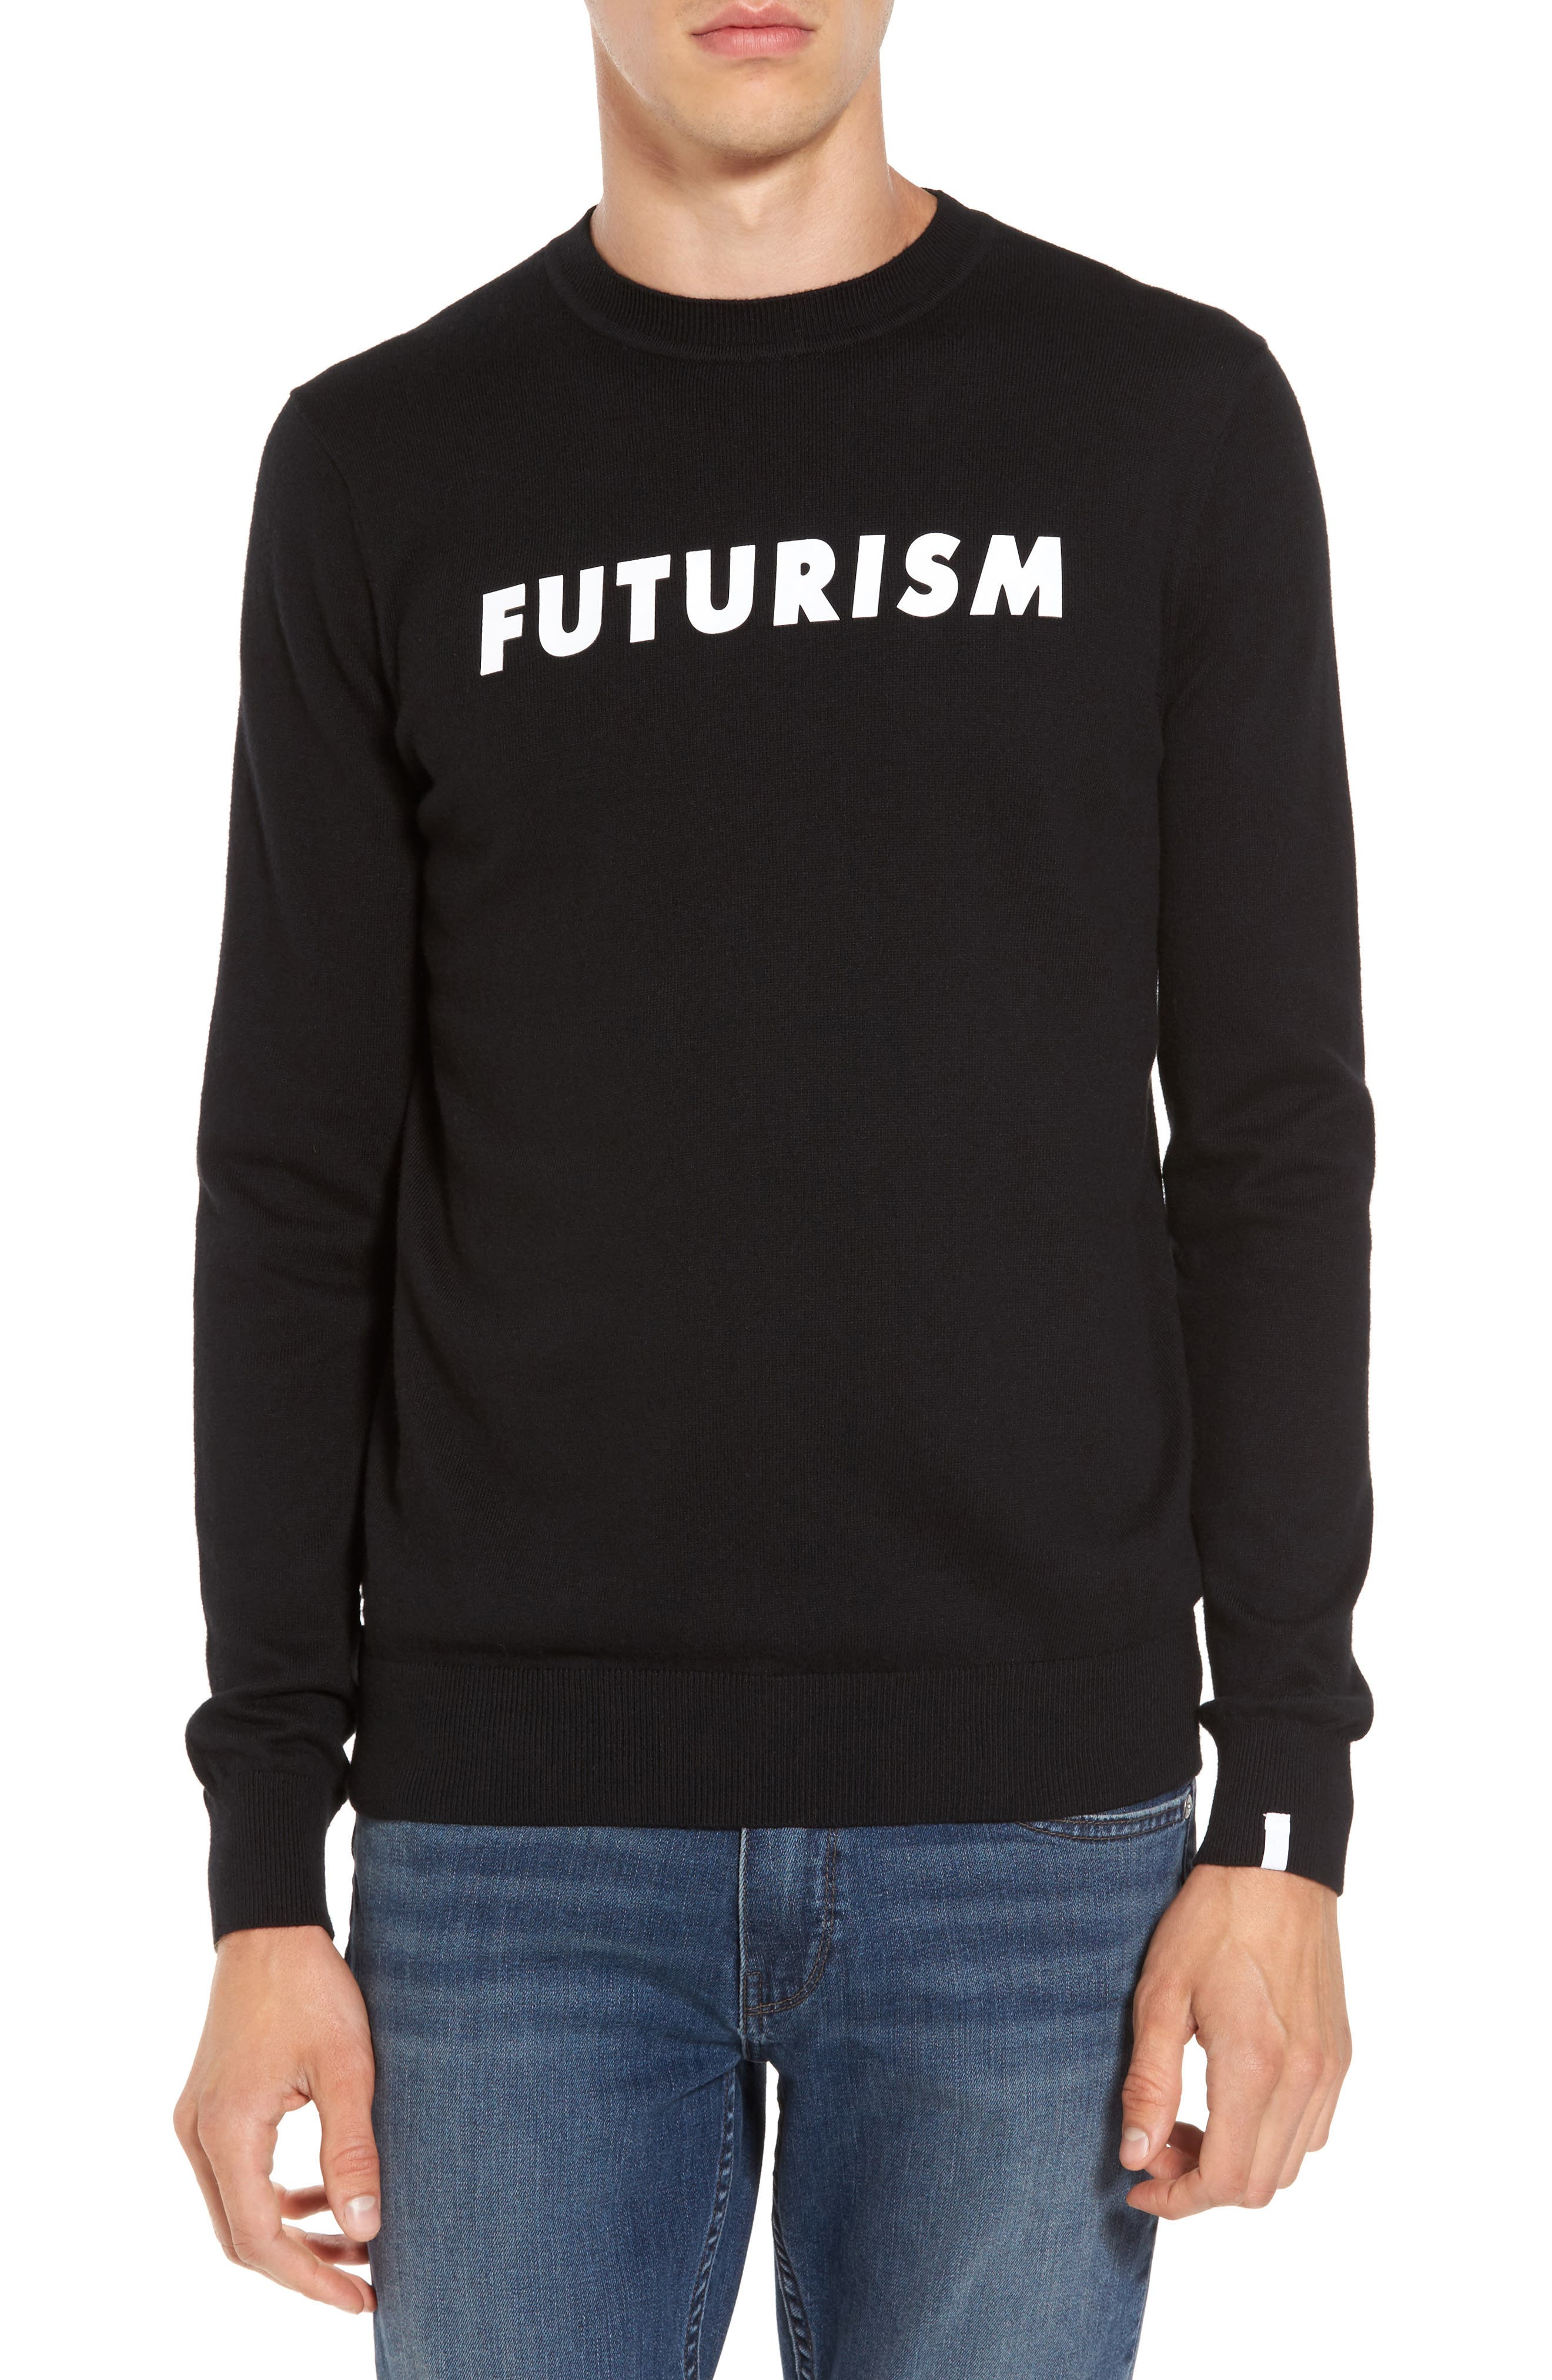 Main Image - Lacoste Futurism Graphic Sweater